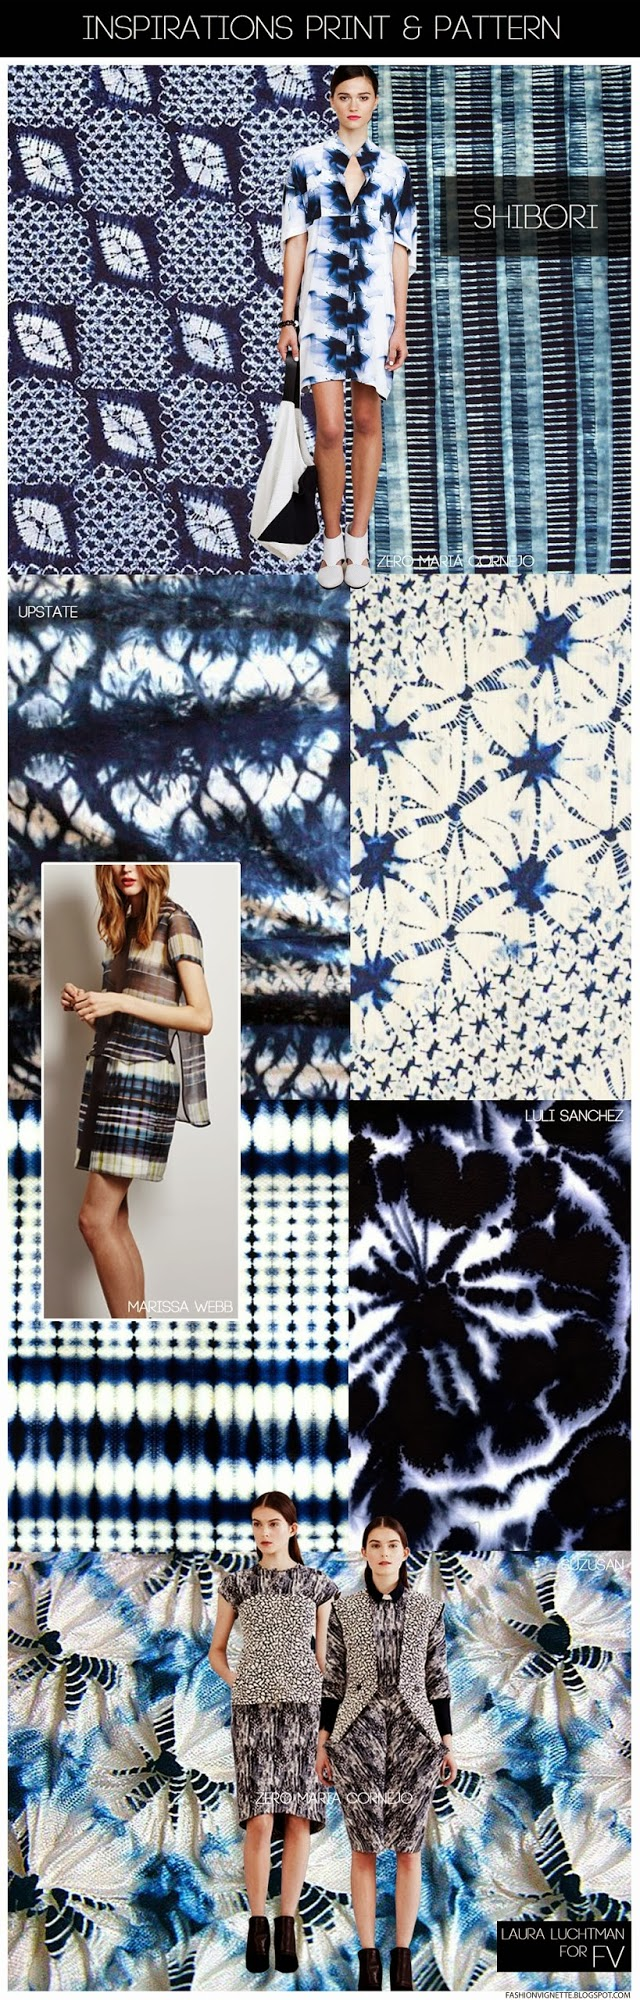 fashion vignette inspirations print pattern kukka by laura luchtman ss 2015 shibori. Black Bedroom Furniture Sets. Home Design Ideas